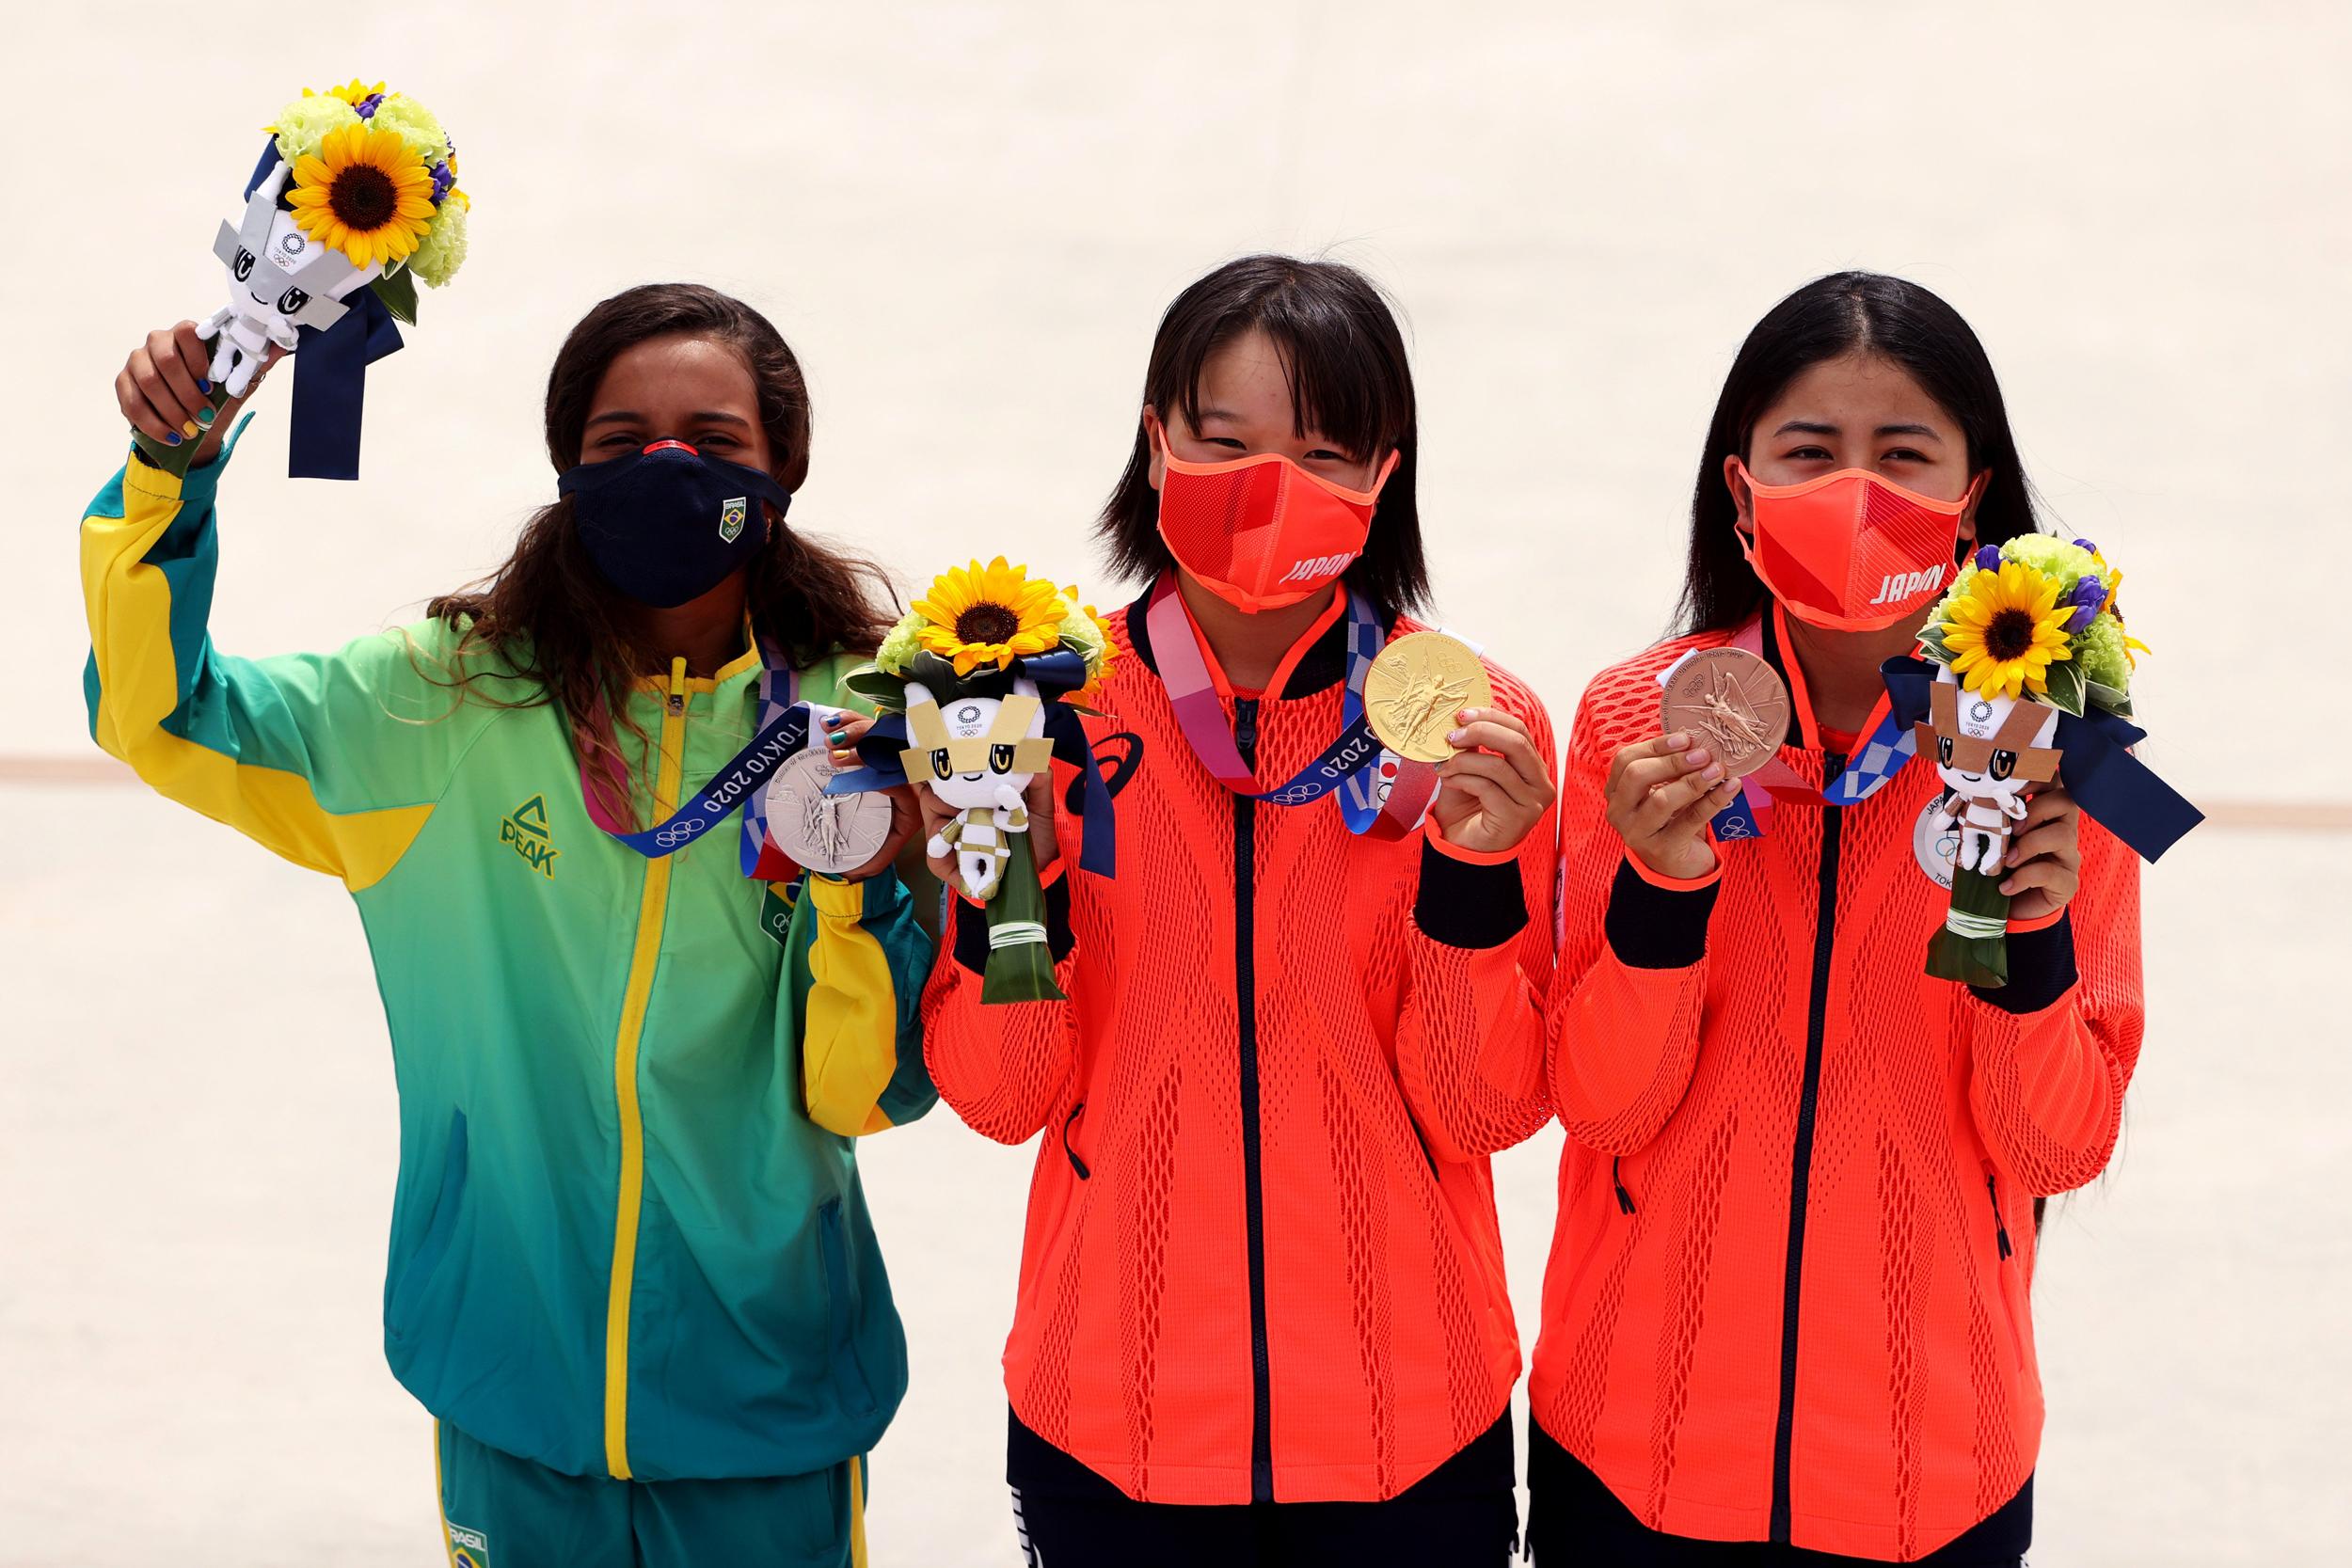 Skateboarding teens blaze trail for women at Tokyo Olympics